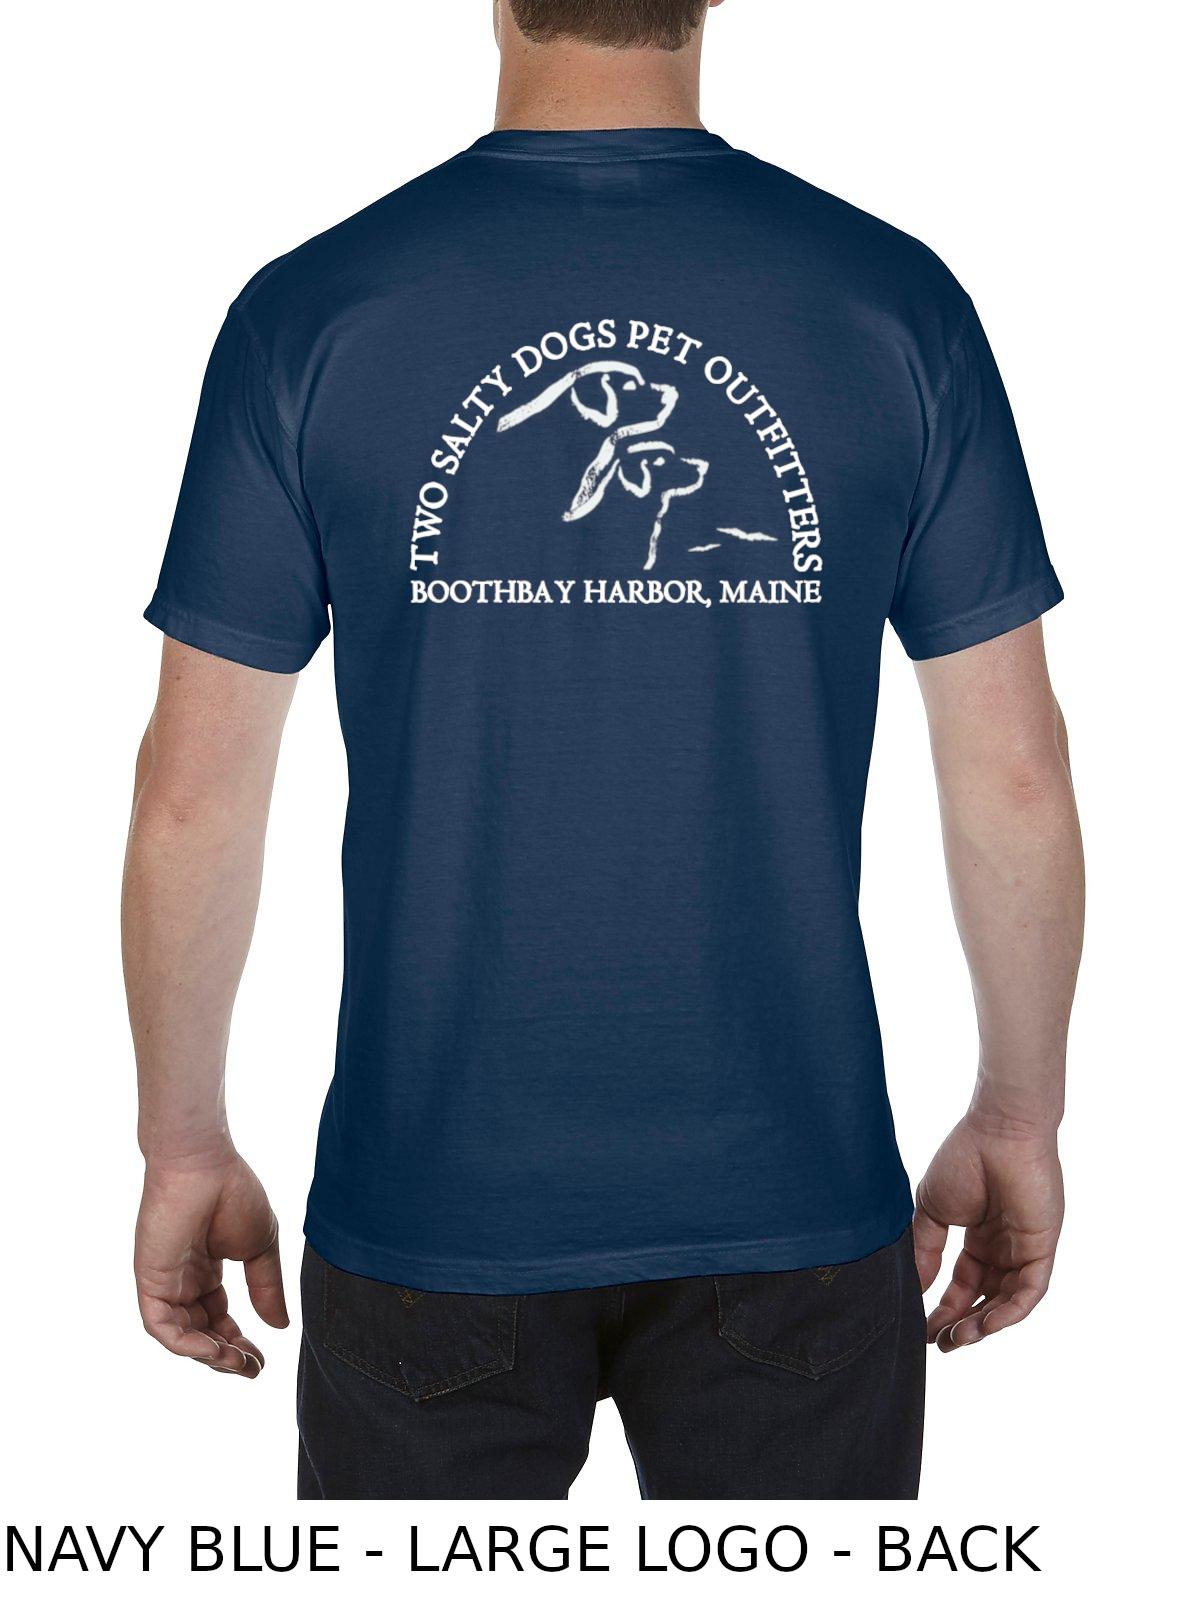 bbha-ss-t-shirt-pocket-navy-blue-back